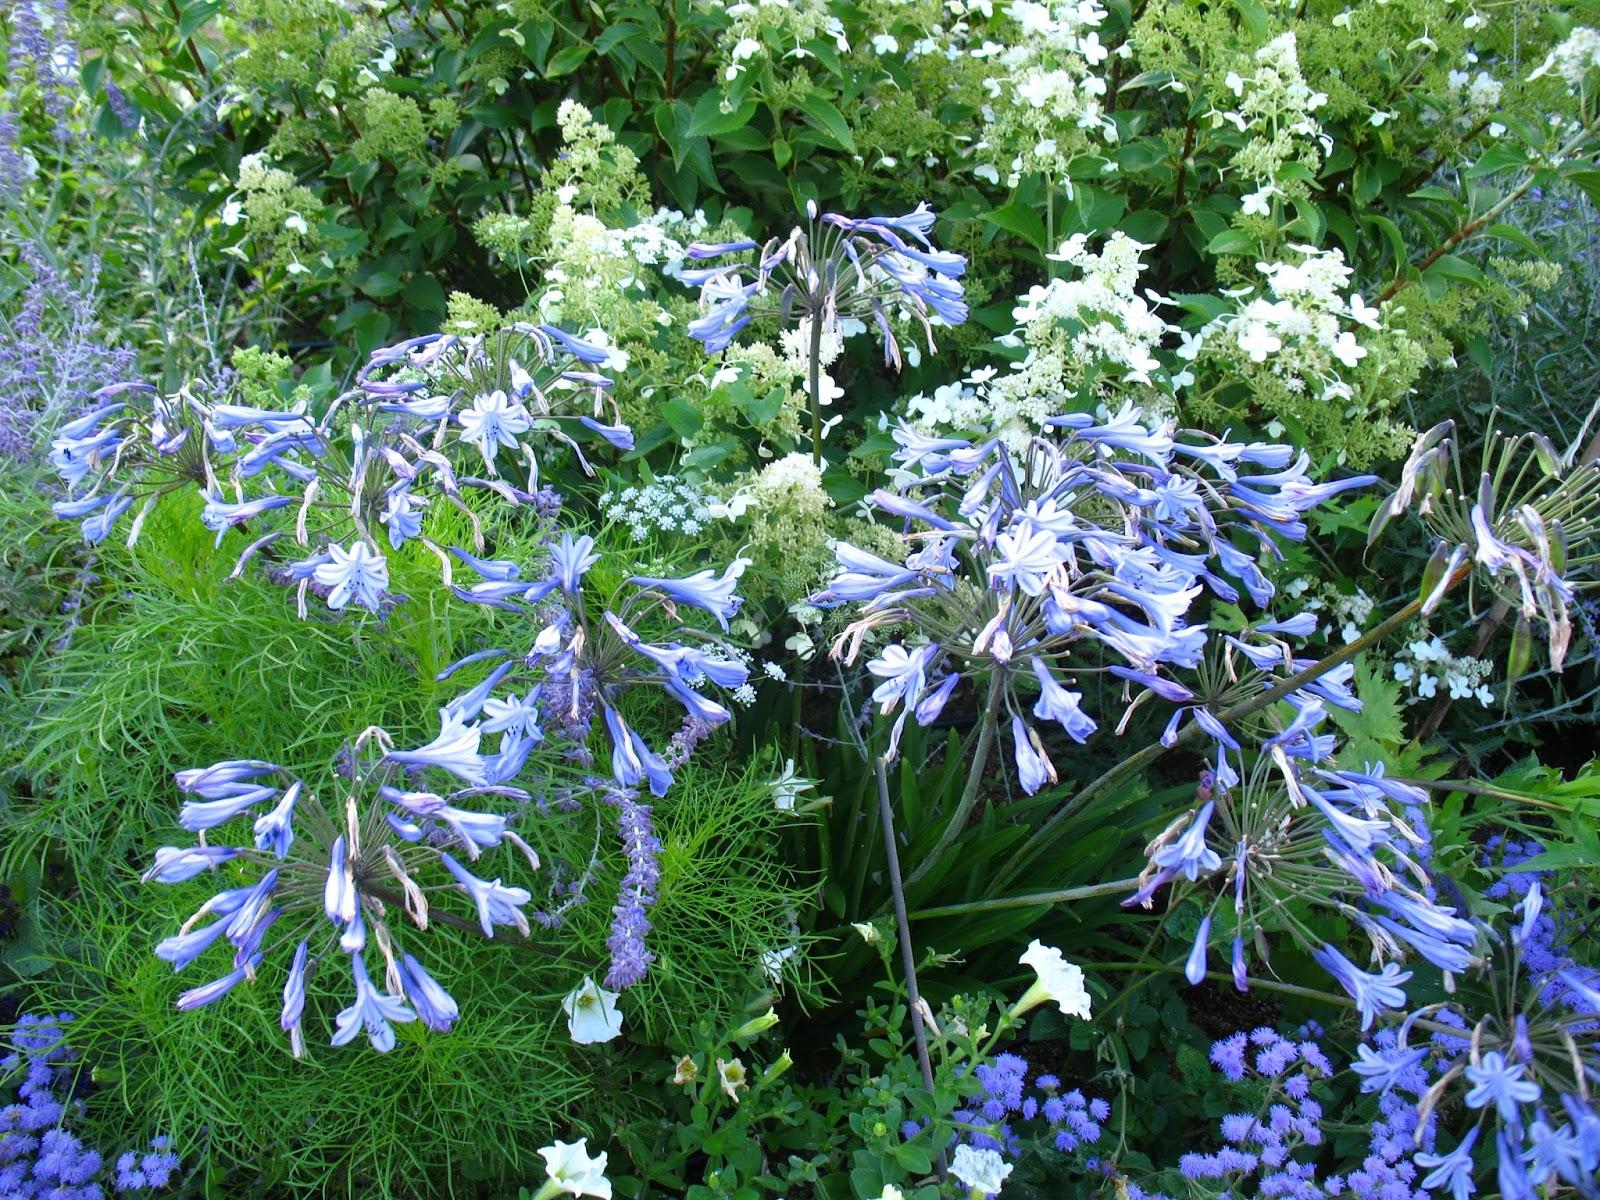 Roses du jardin Chªneland Un cama¯eu de fleurs bleues